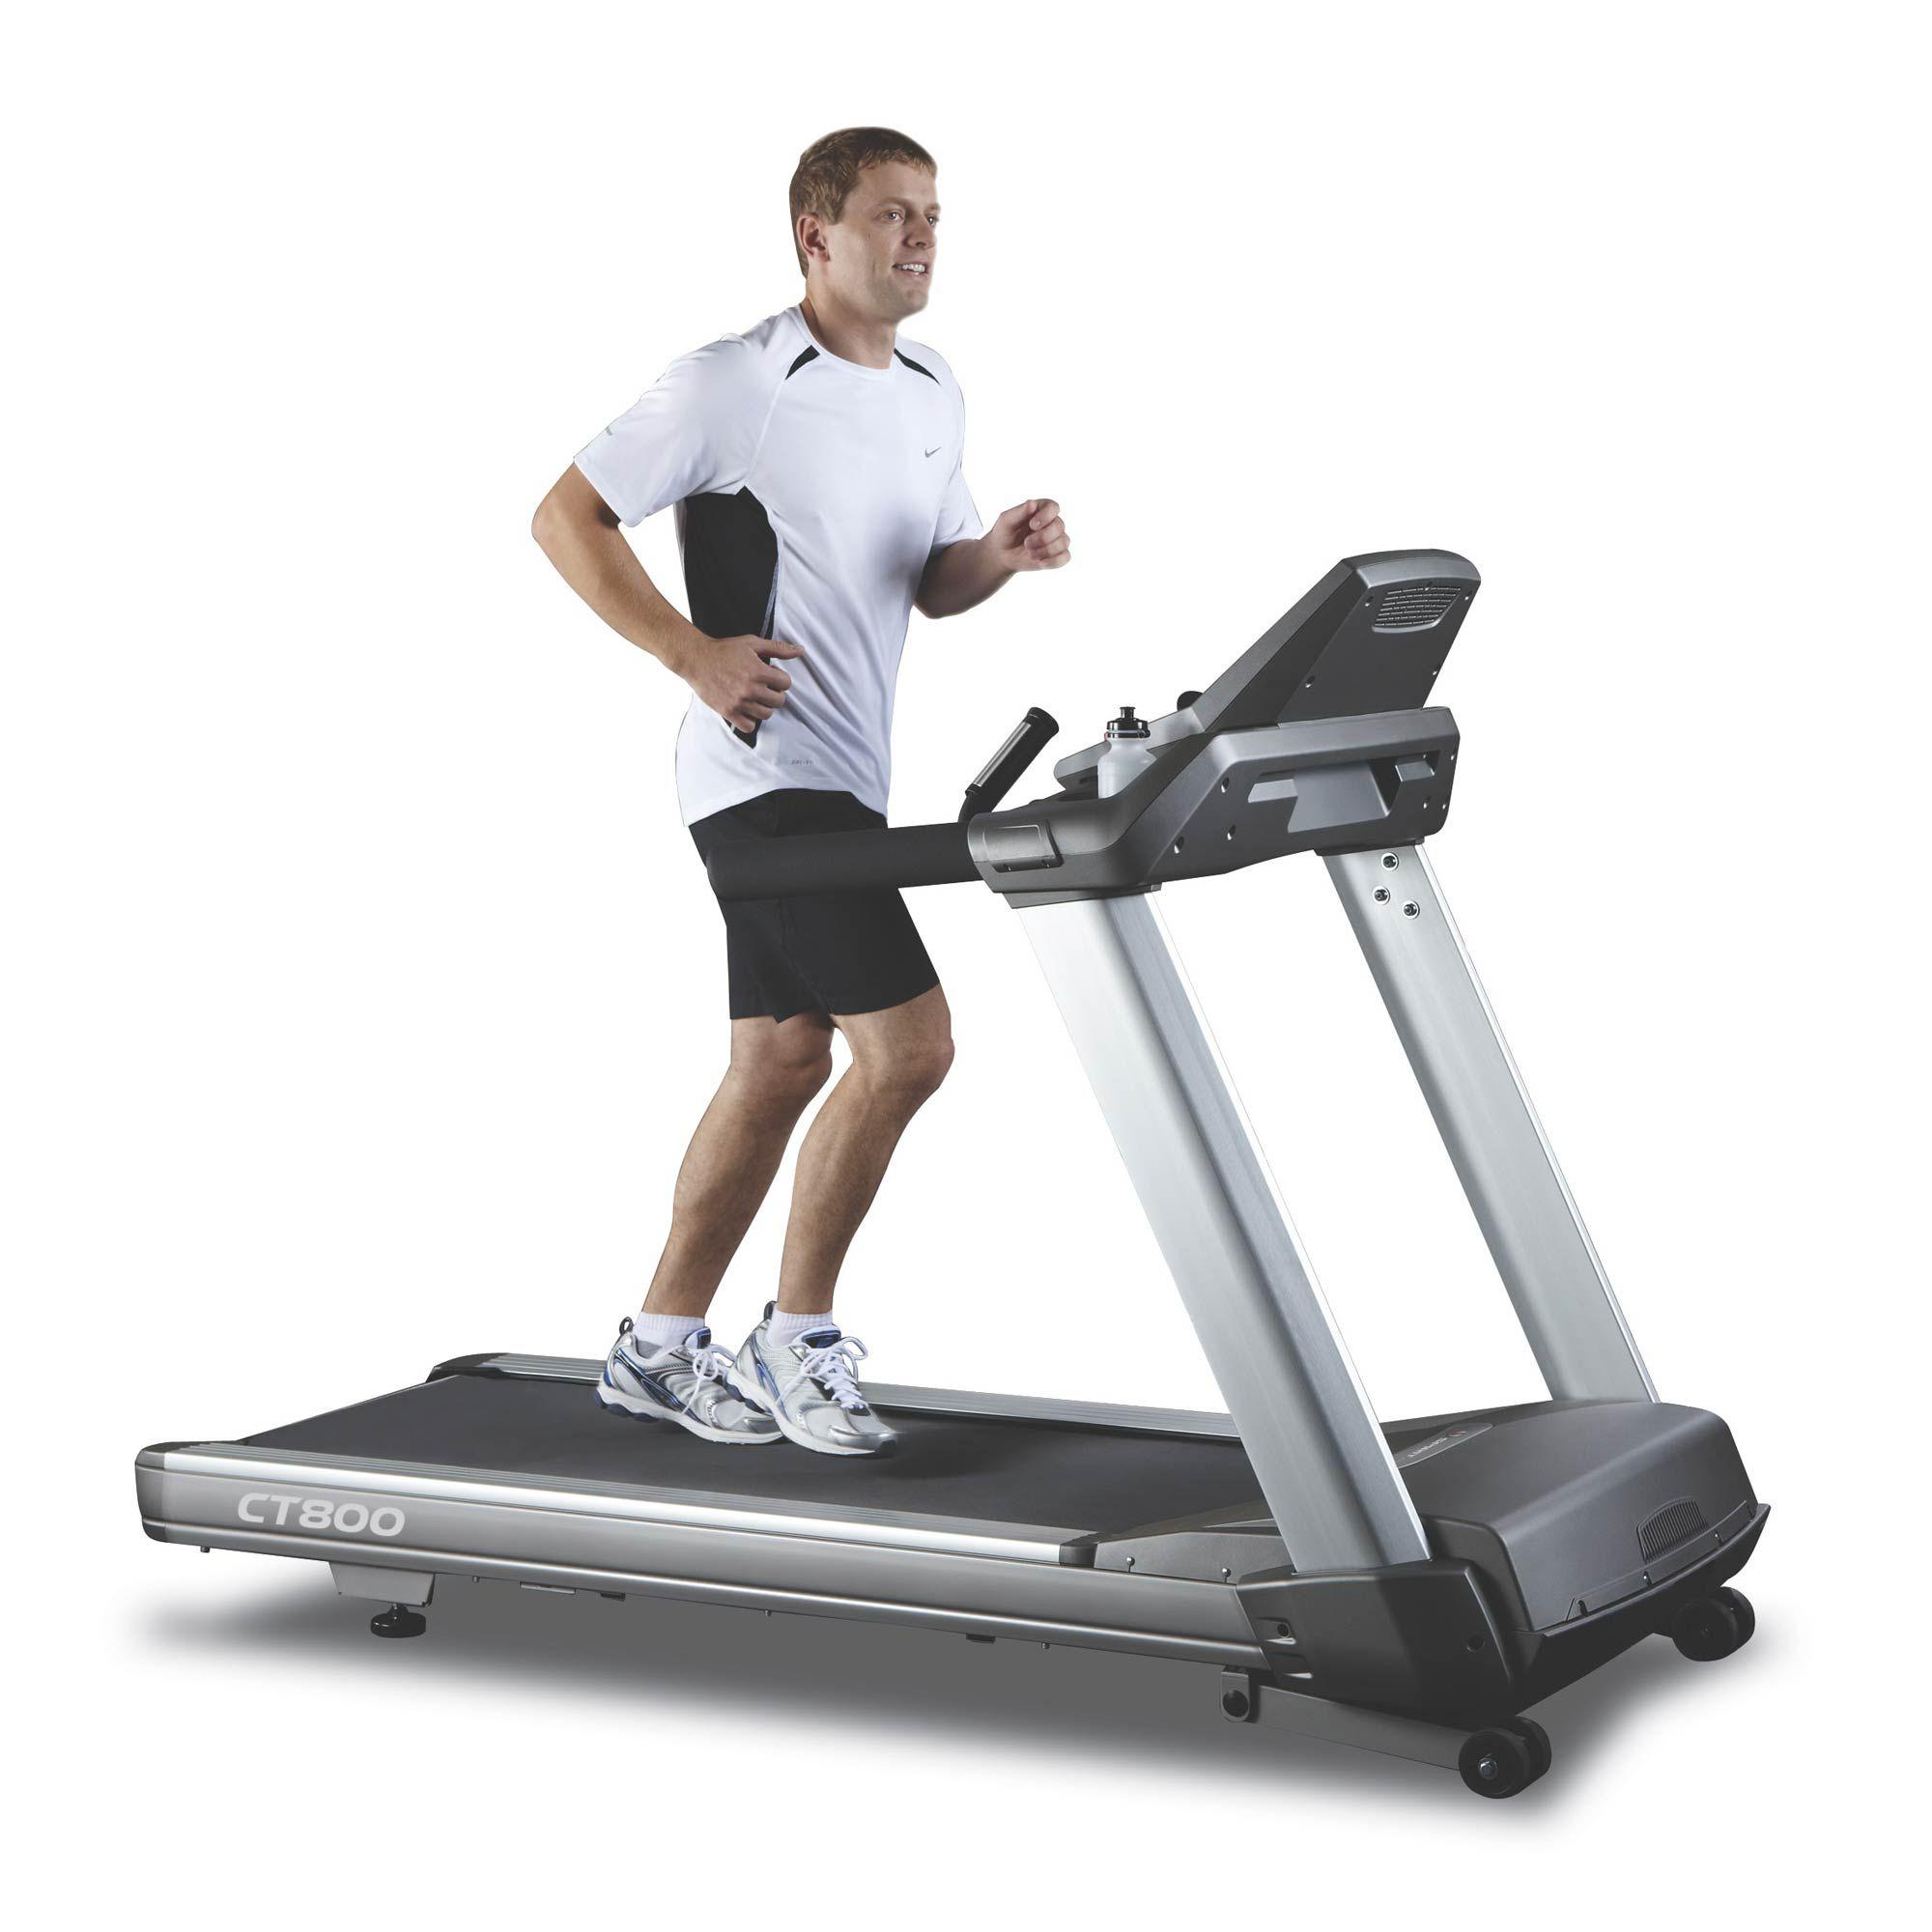 Spirit ct800 club series treadmill - Tapis de course energetics power run 4 0 ...